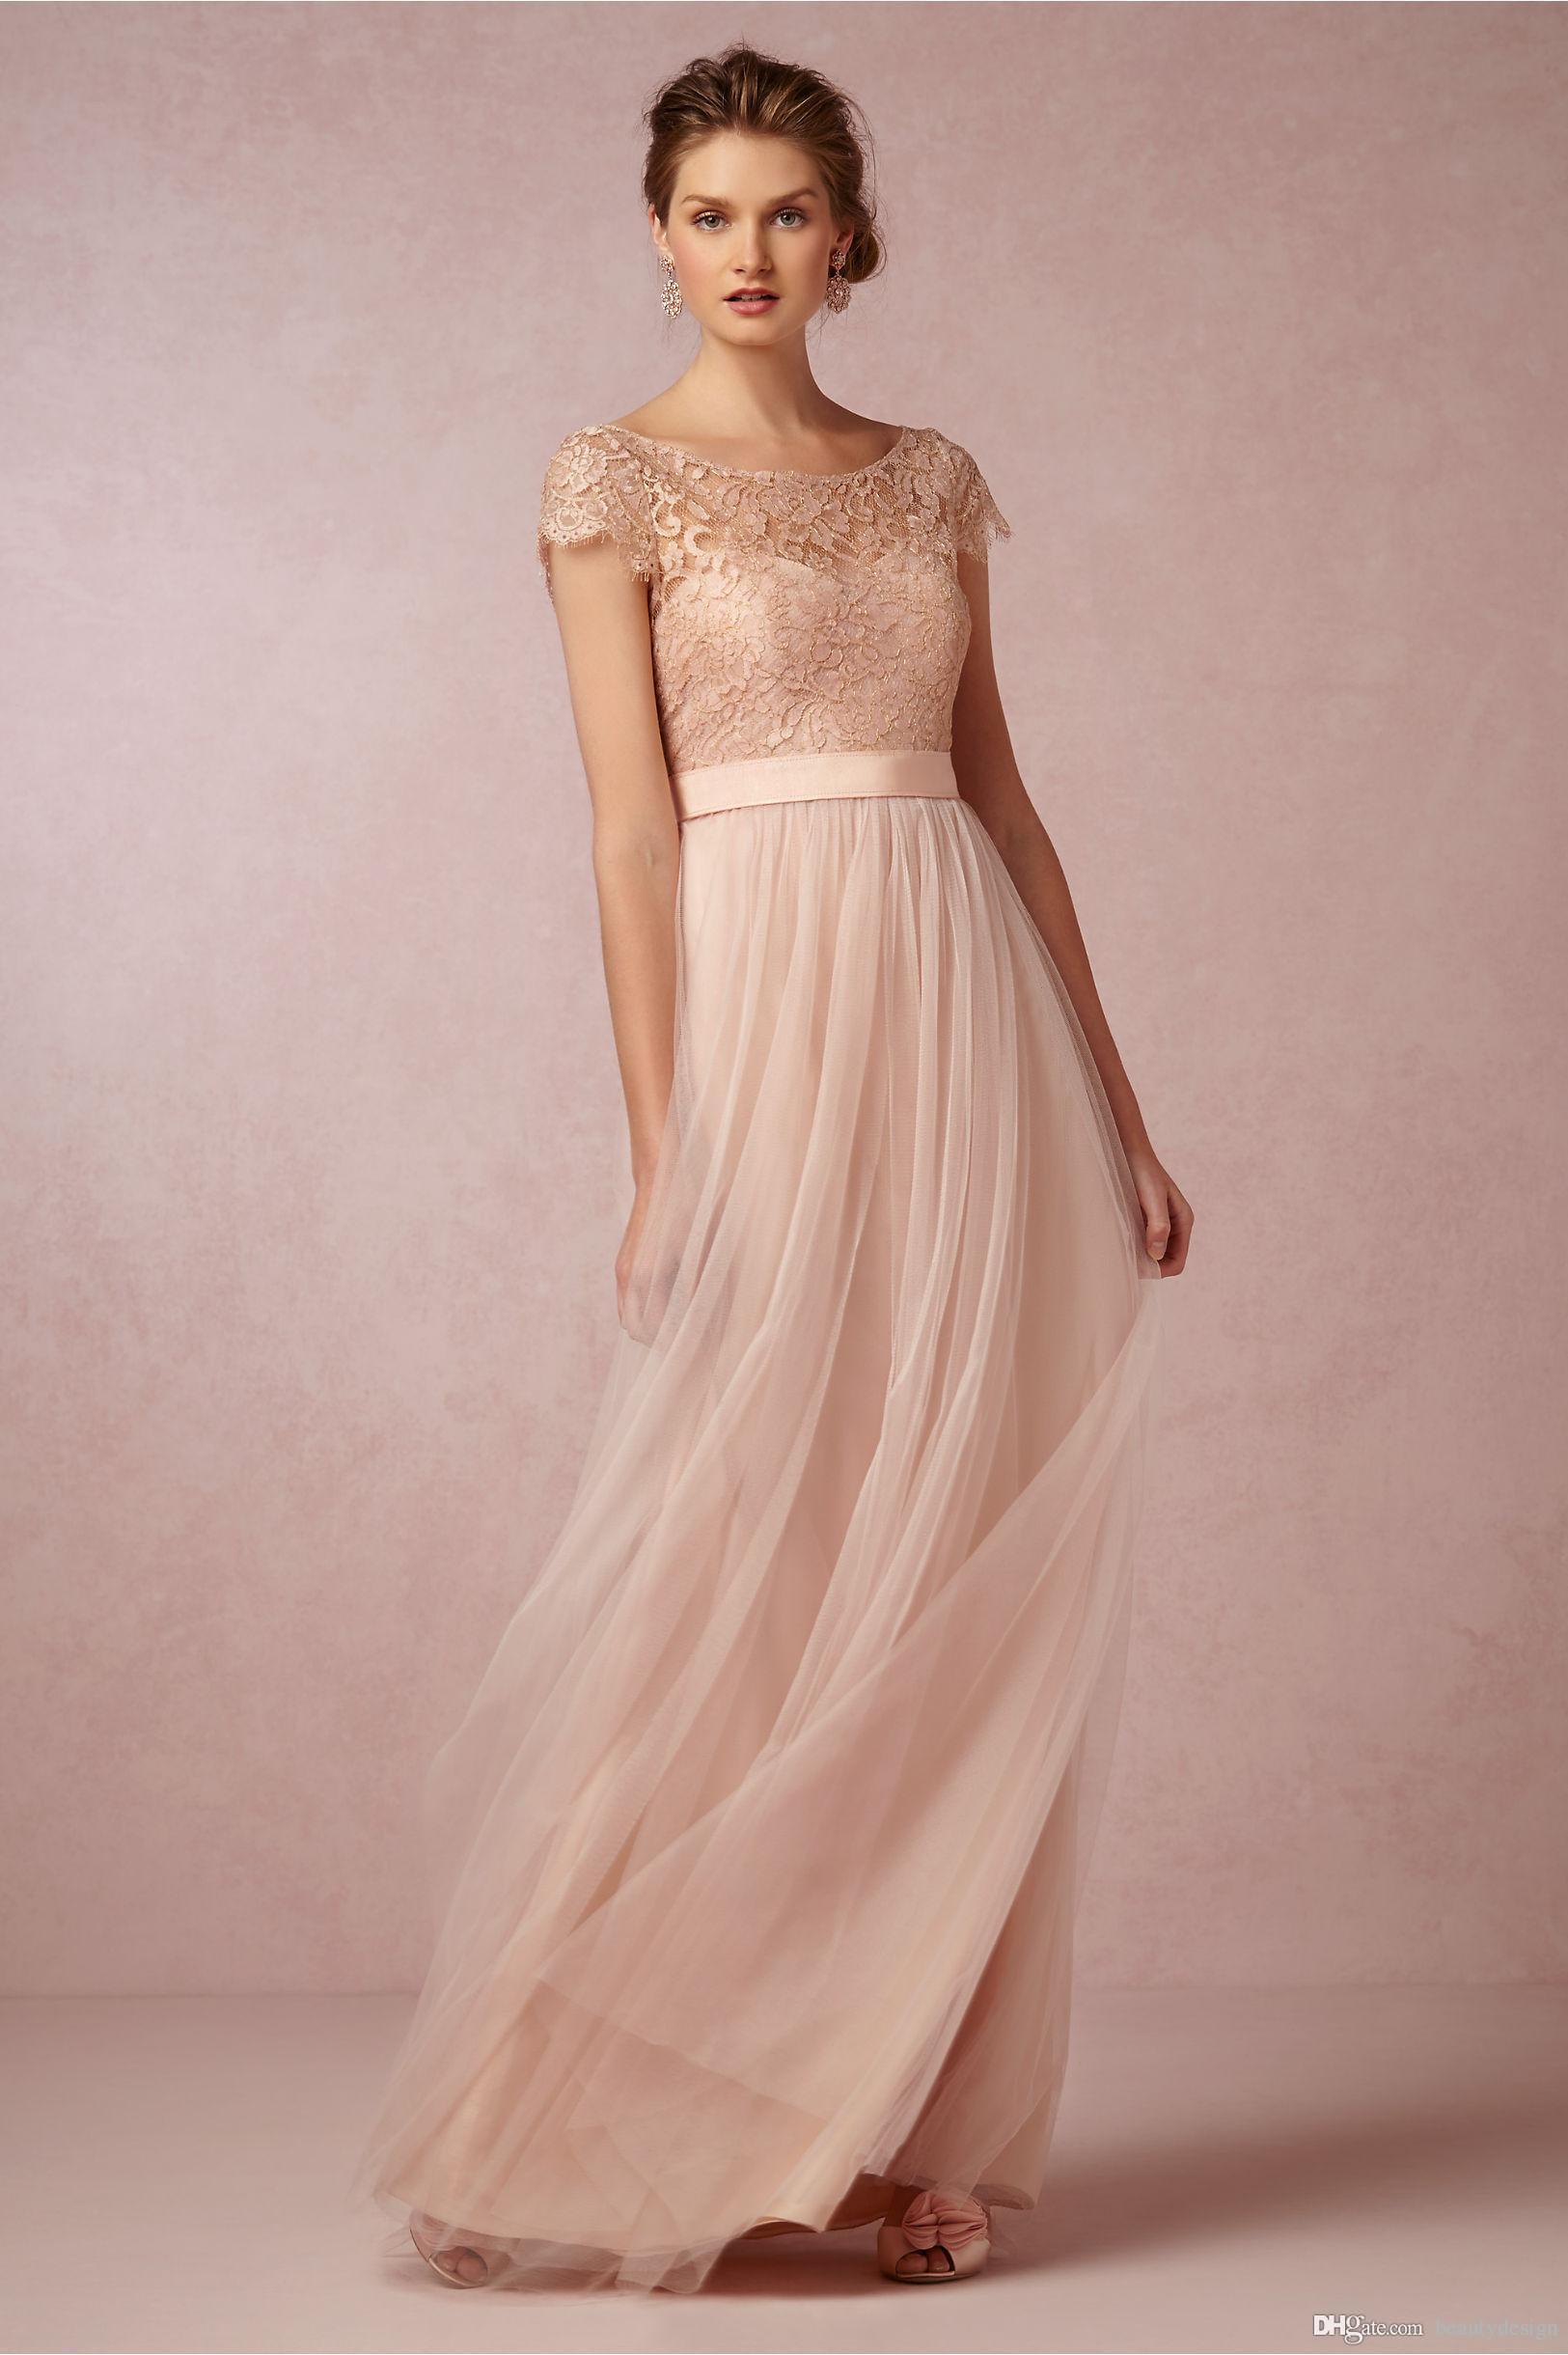 2017 Vintage Allık Dantel Uzun Gelinlik Modelleri Illusion Bateau pink bridesmaid dress